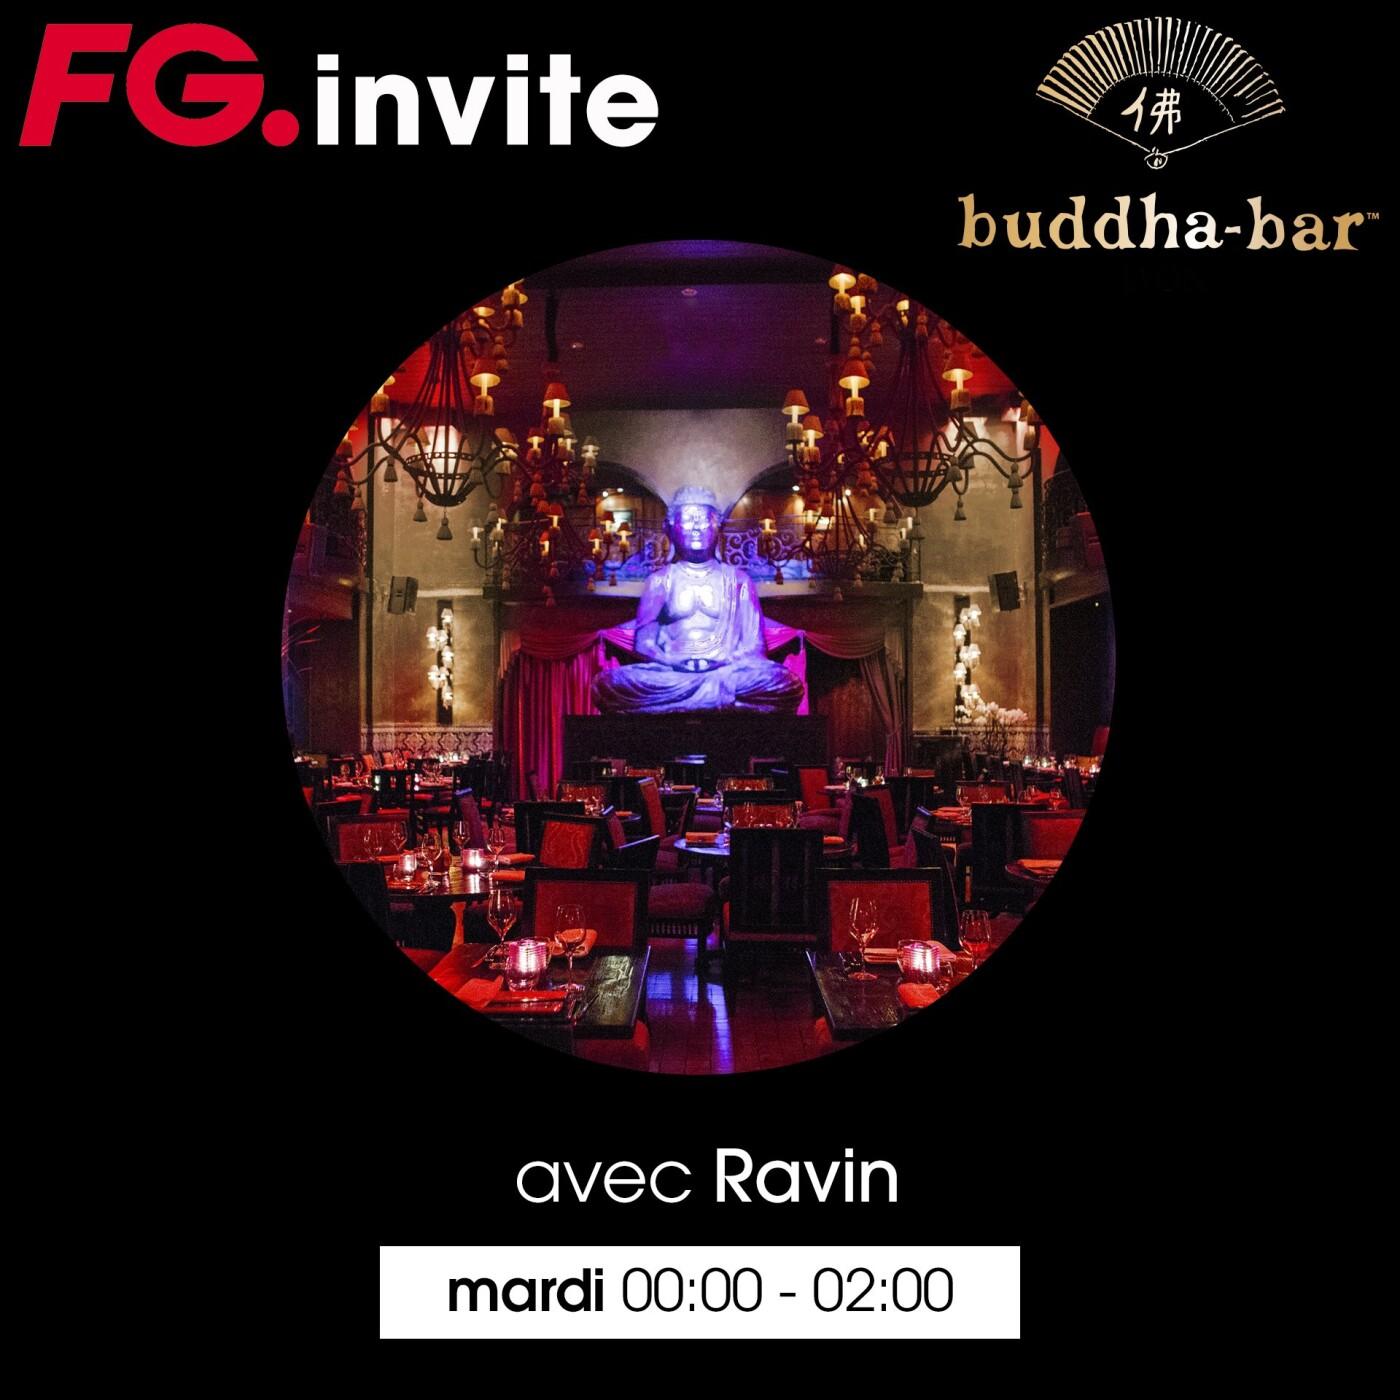 FG INVITE : LE BUDDHA BAR DE PARIS